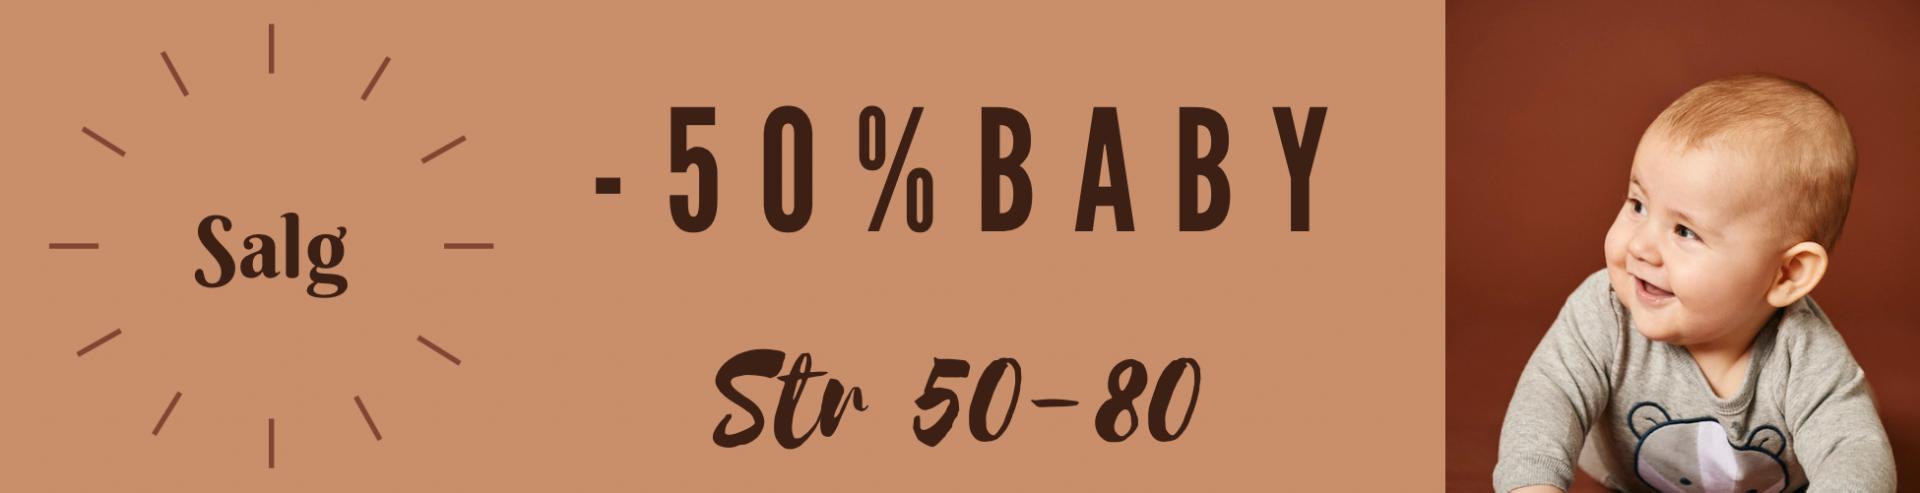 Januarsalg baby -50%